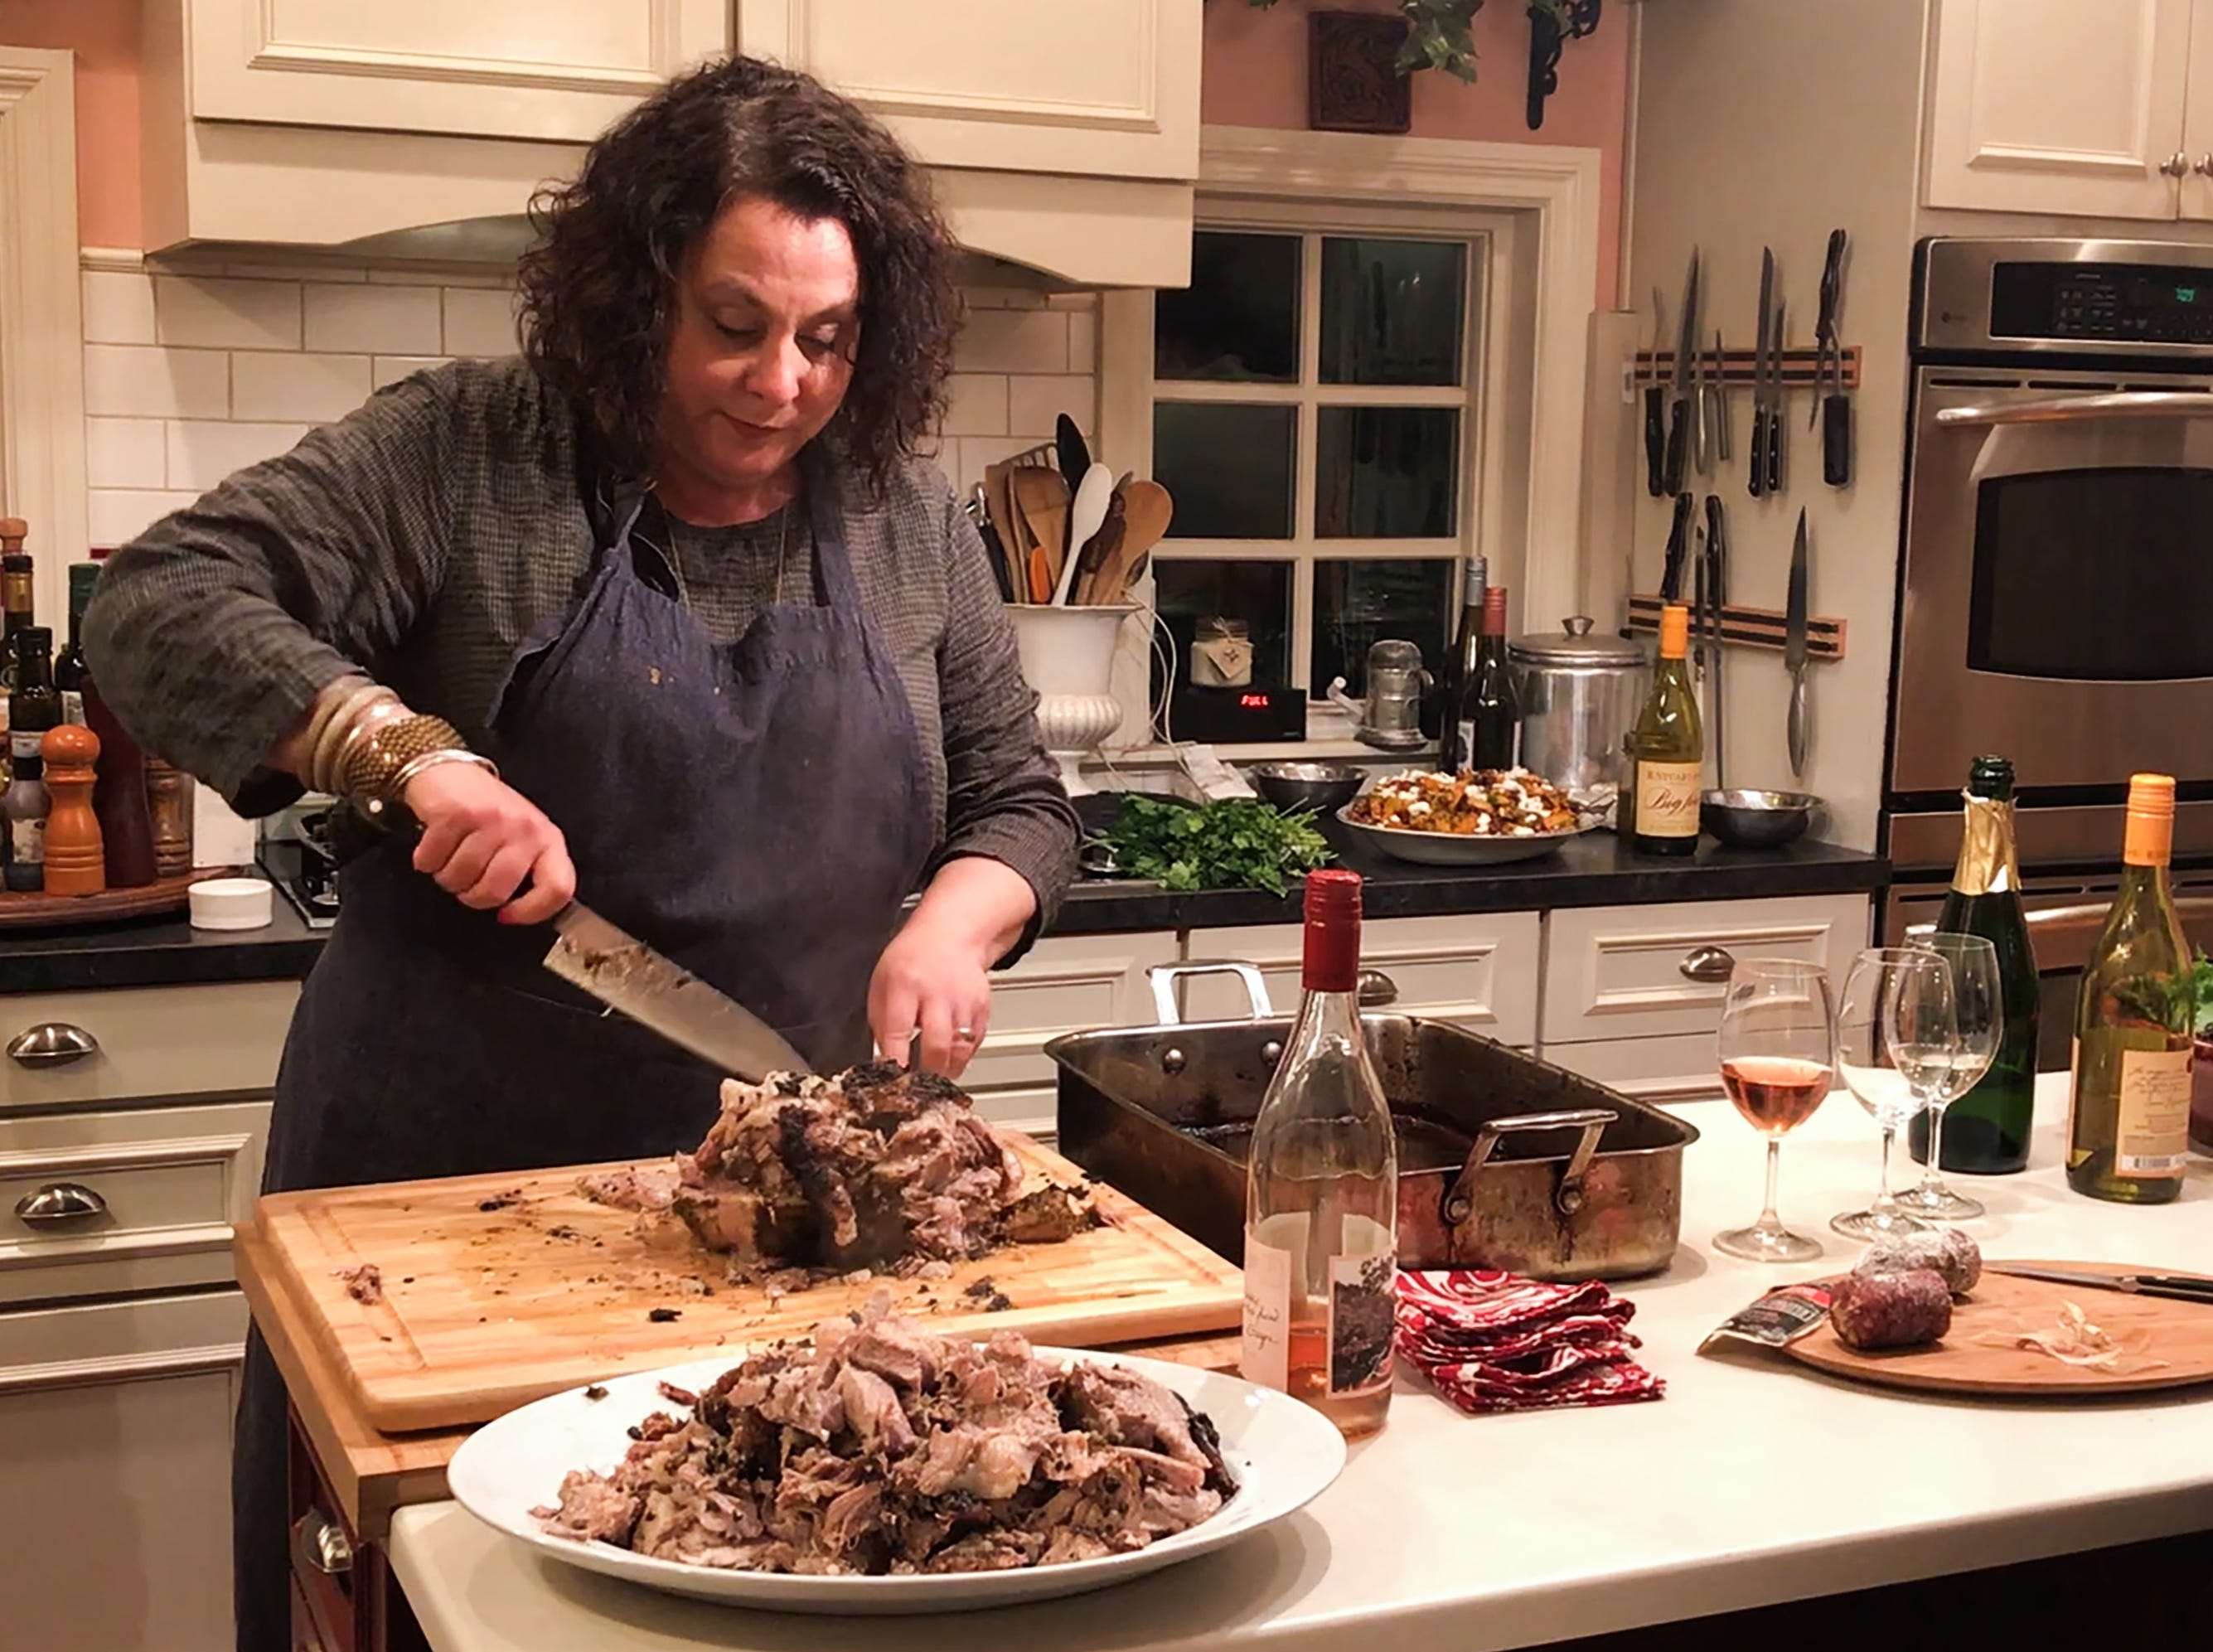 R. Stuart & Co. cofounder Maria Stuart prepares a pork roast for a dinner she hosted on Nov. 7, 2018, in McMinnville.